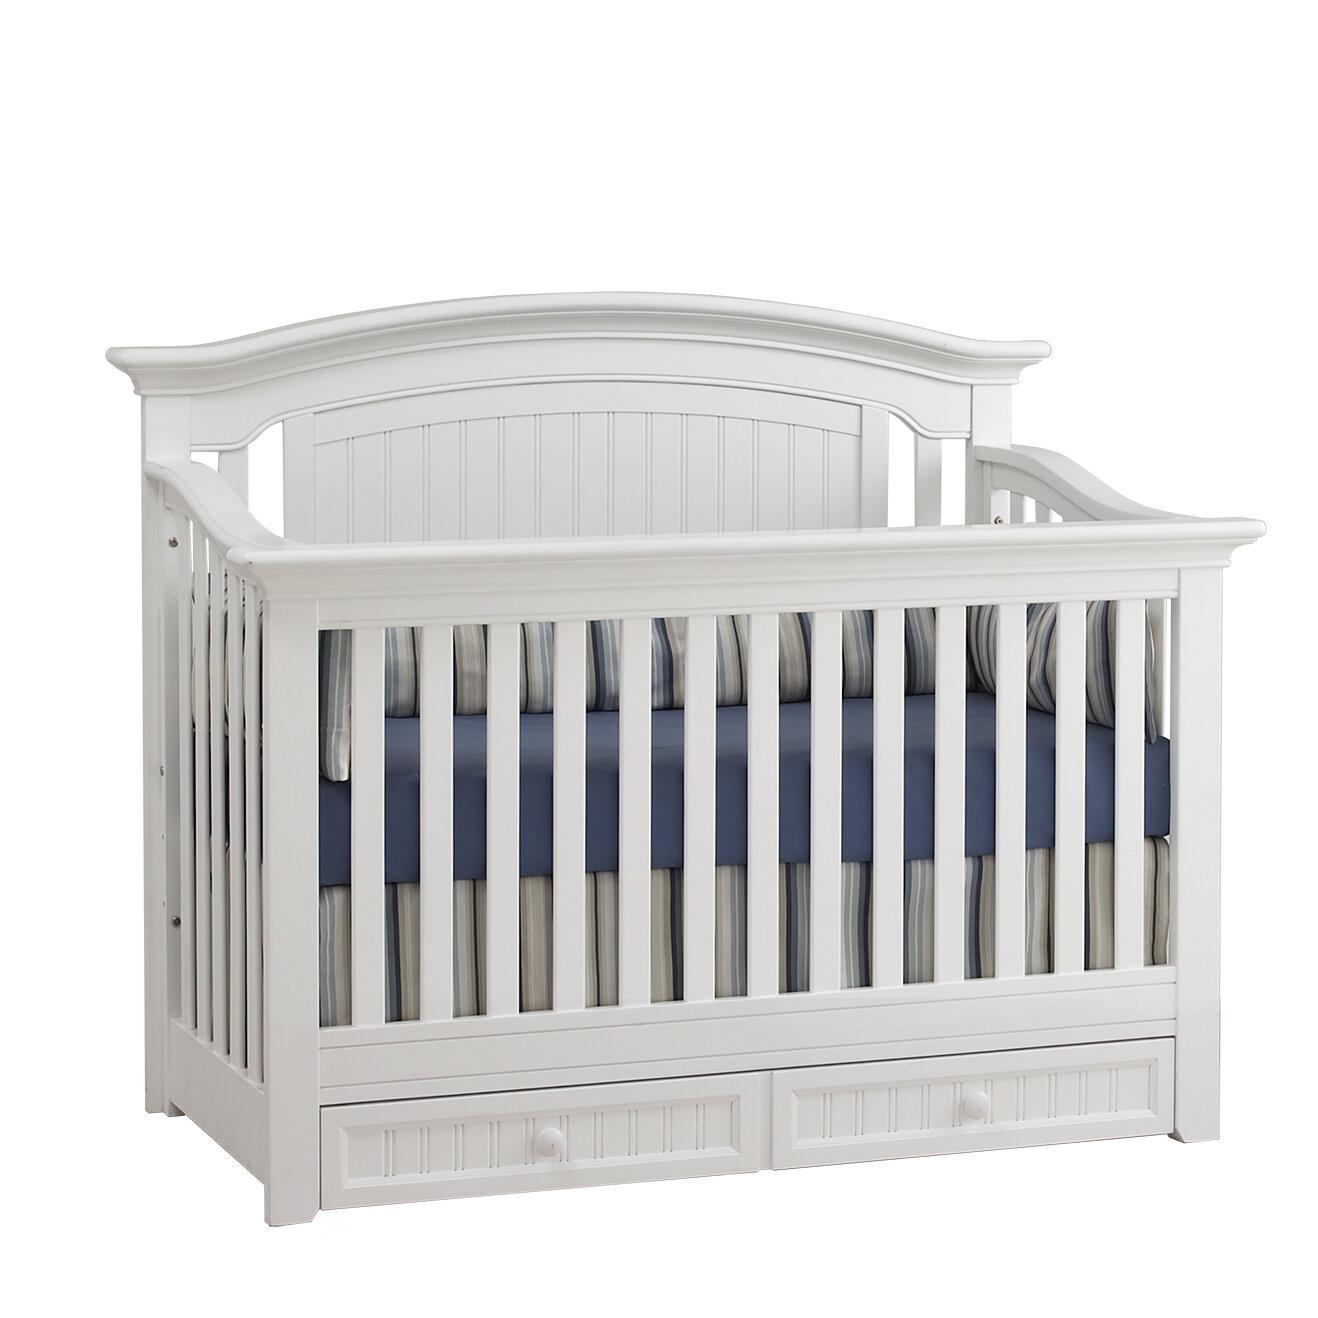 Winchester 4-in-1 Convertible Crib